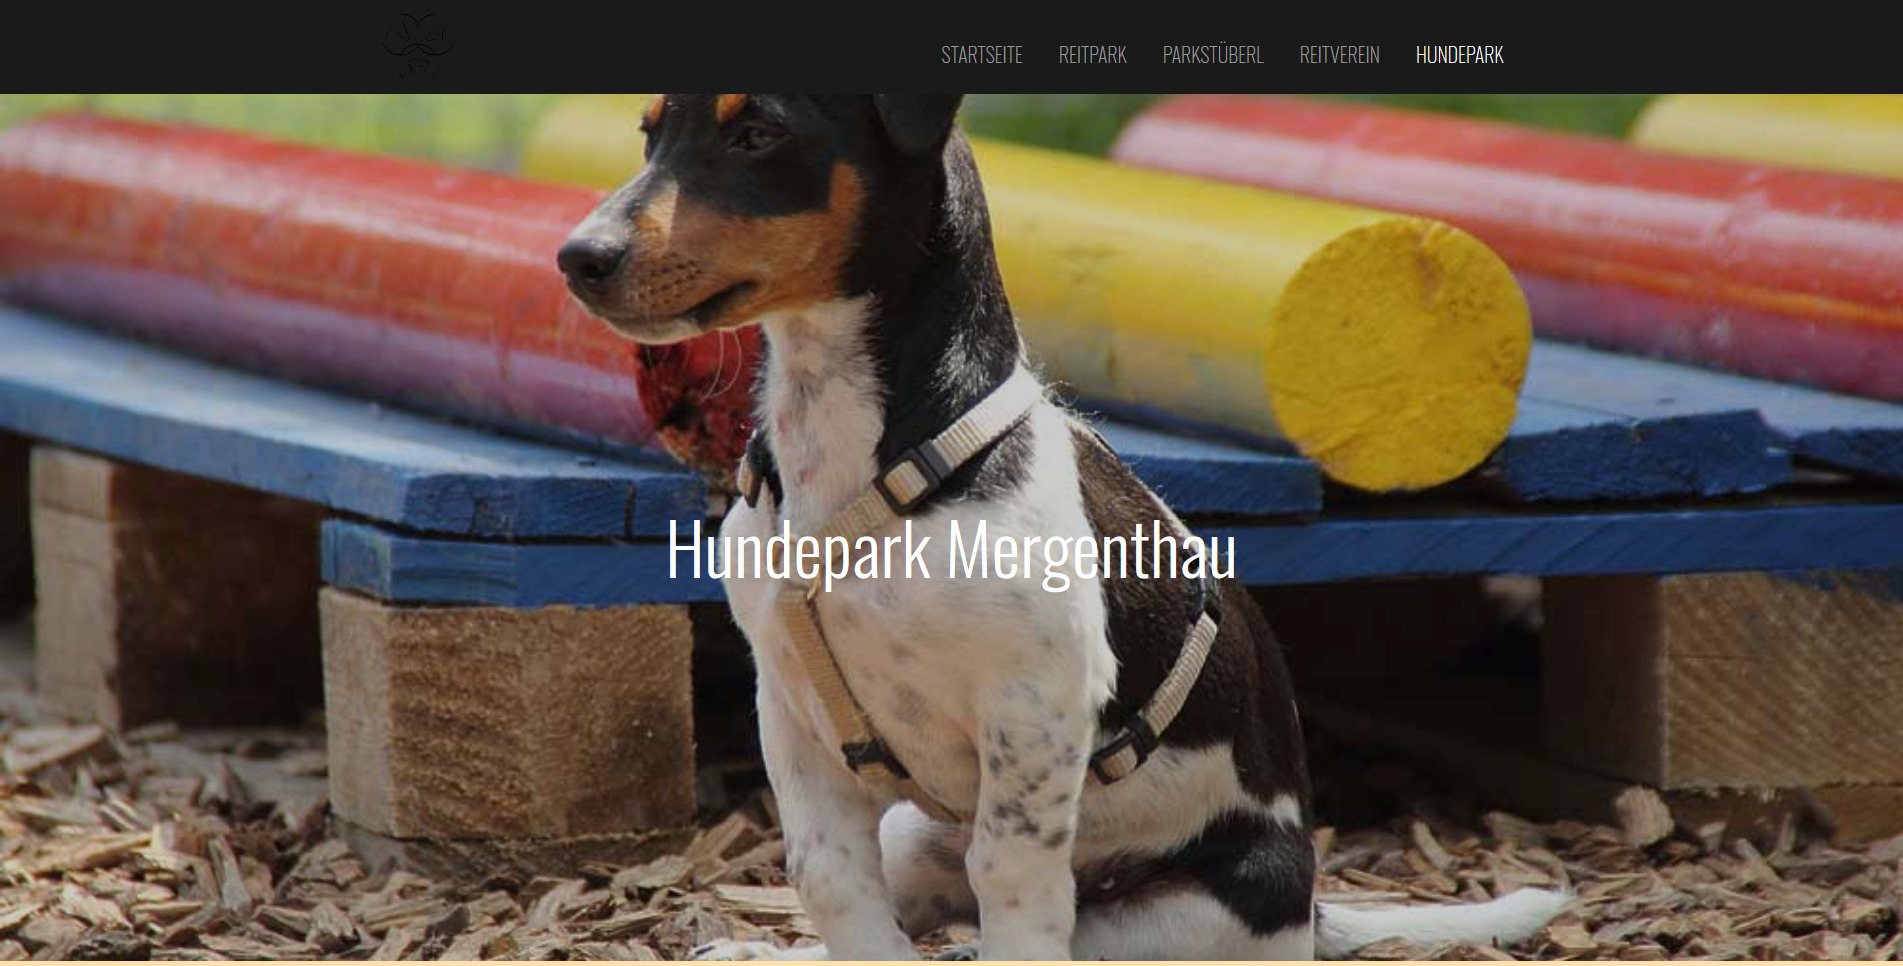 Hundepark Mergenthau